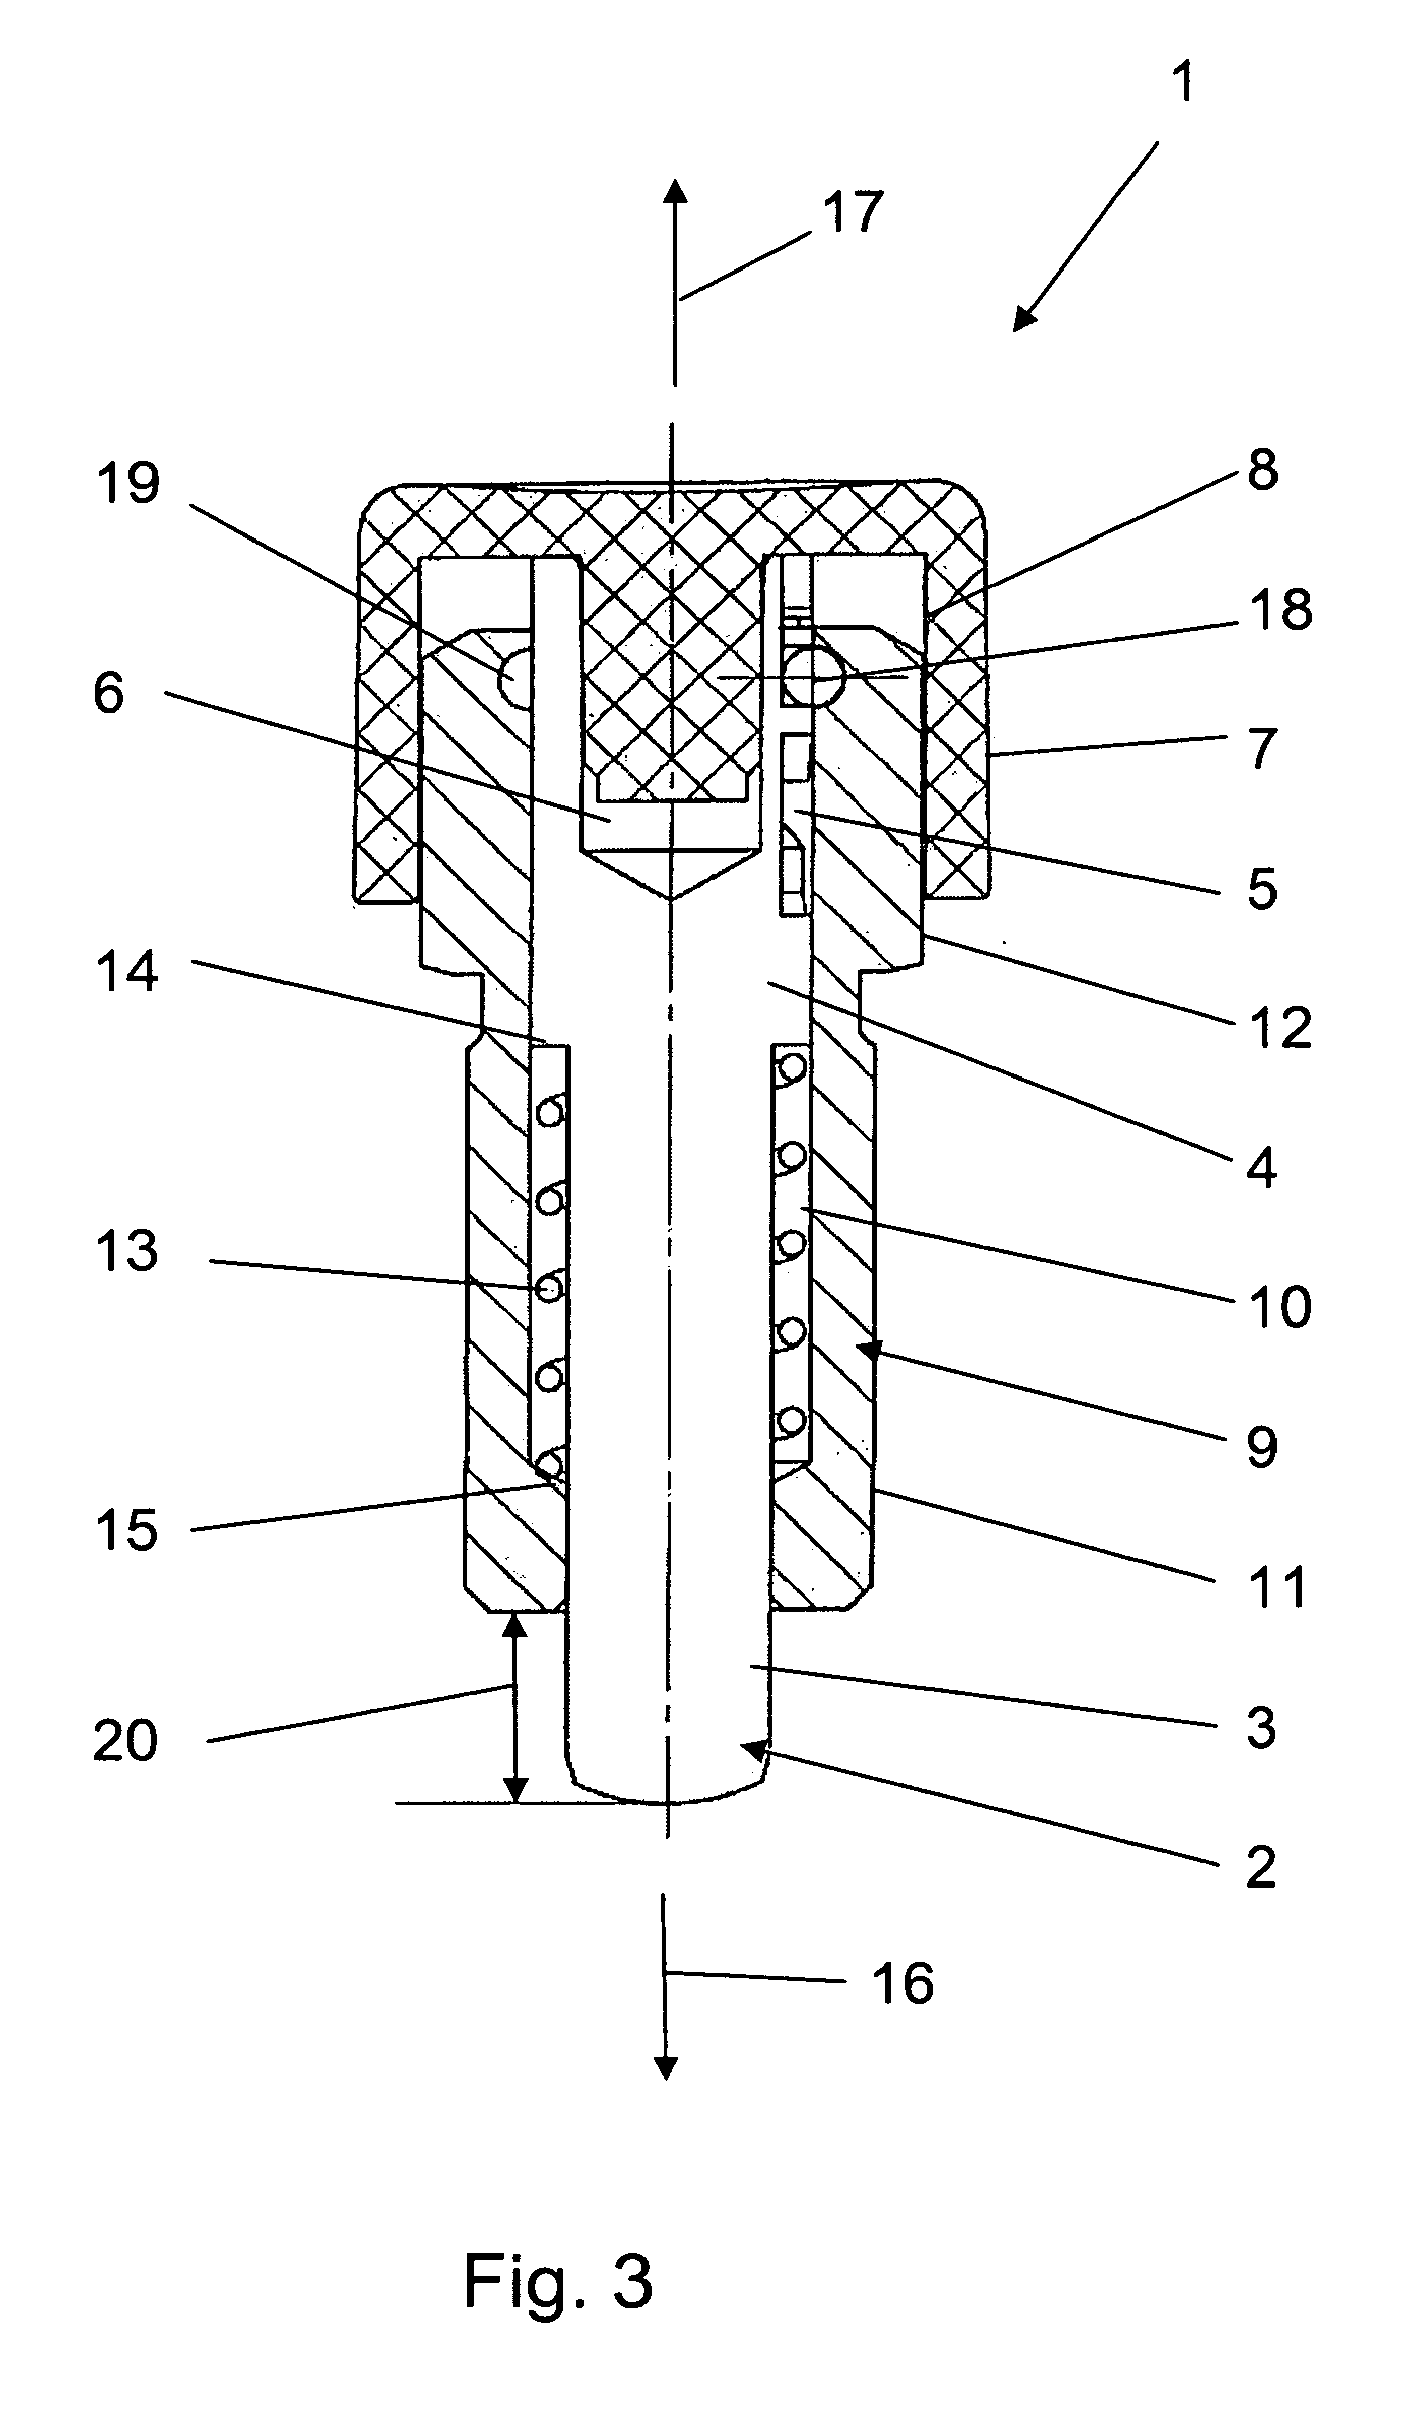 patent ep2175093a2 rastbolzen mit verriegelungsmechanik google patents. Black Bedroom Furniture Sets. Home Design Ideas